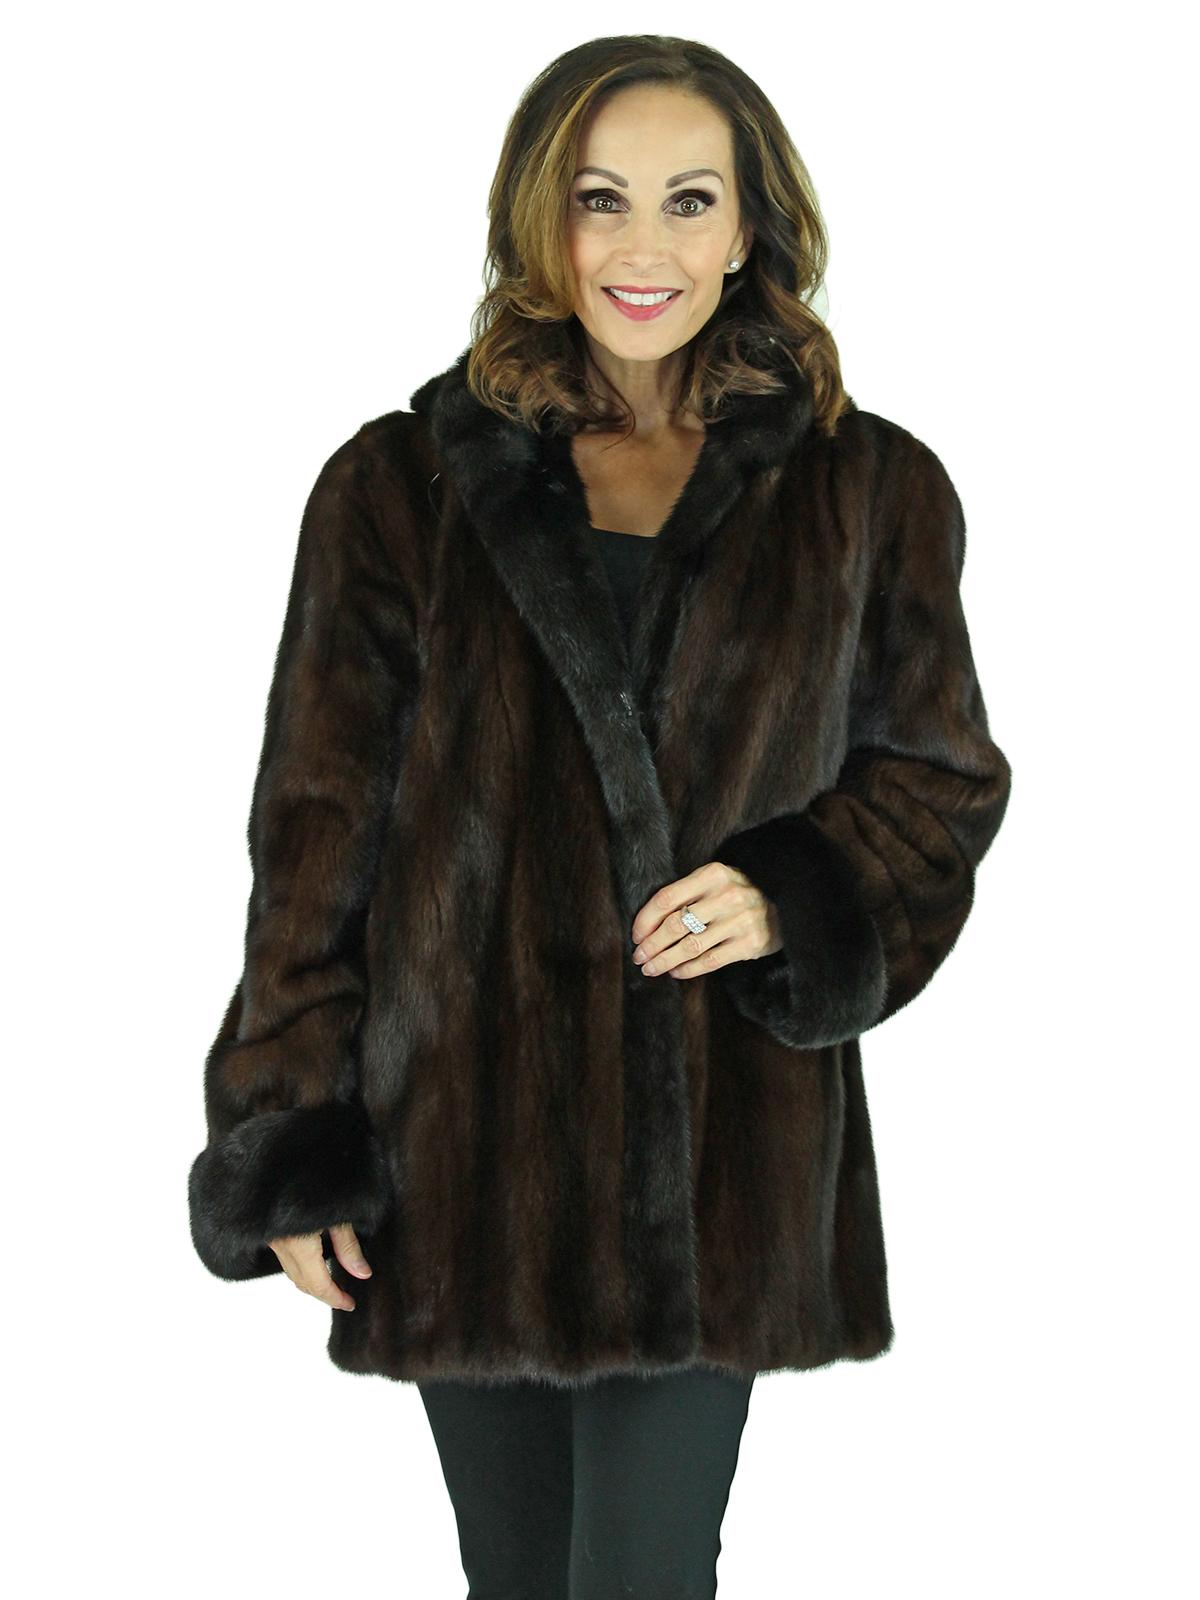 Woman's Mahogany Female Mink Fur Jacket with Detachable Hood